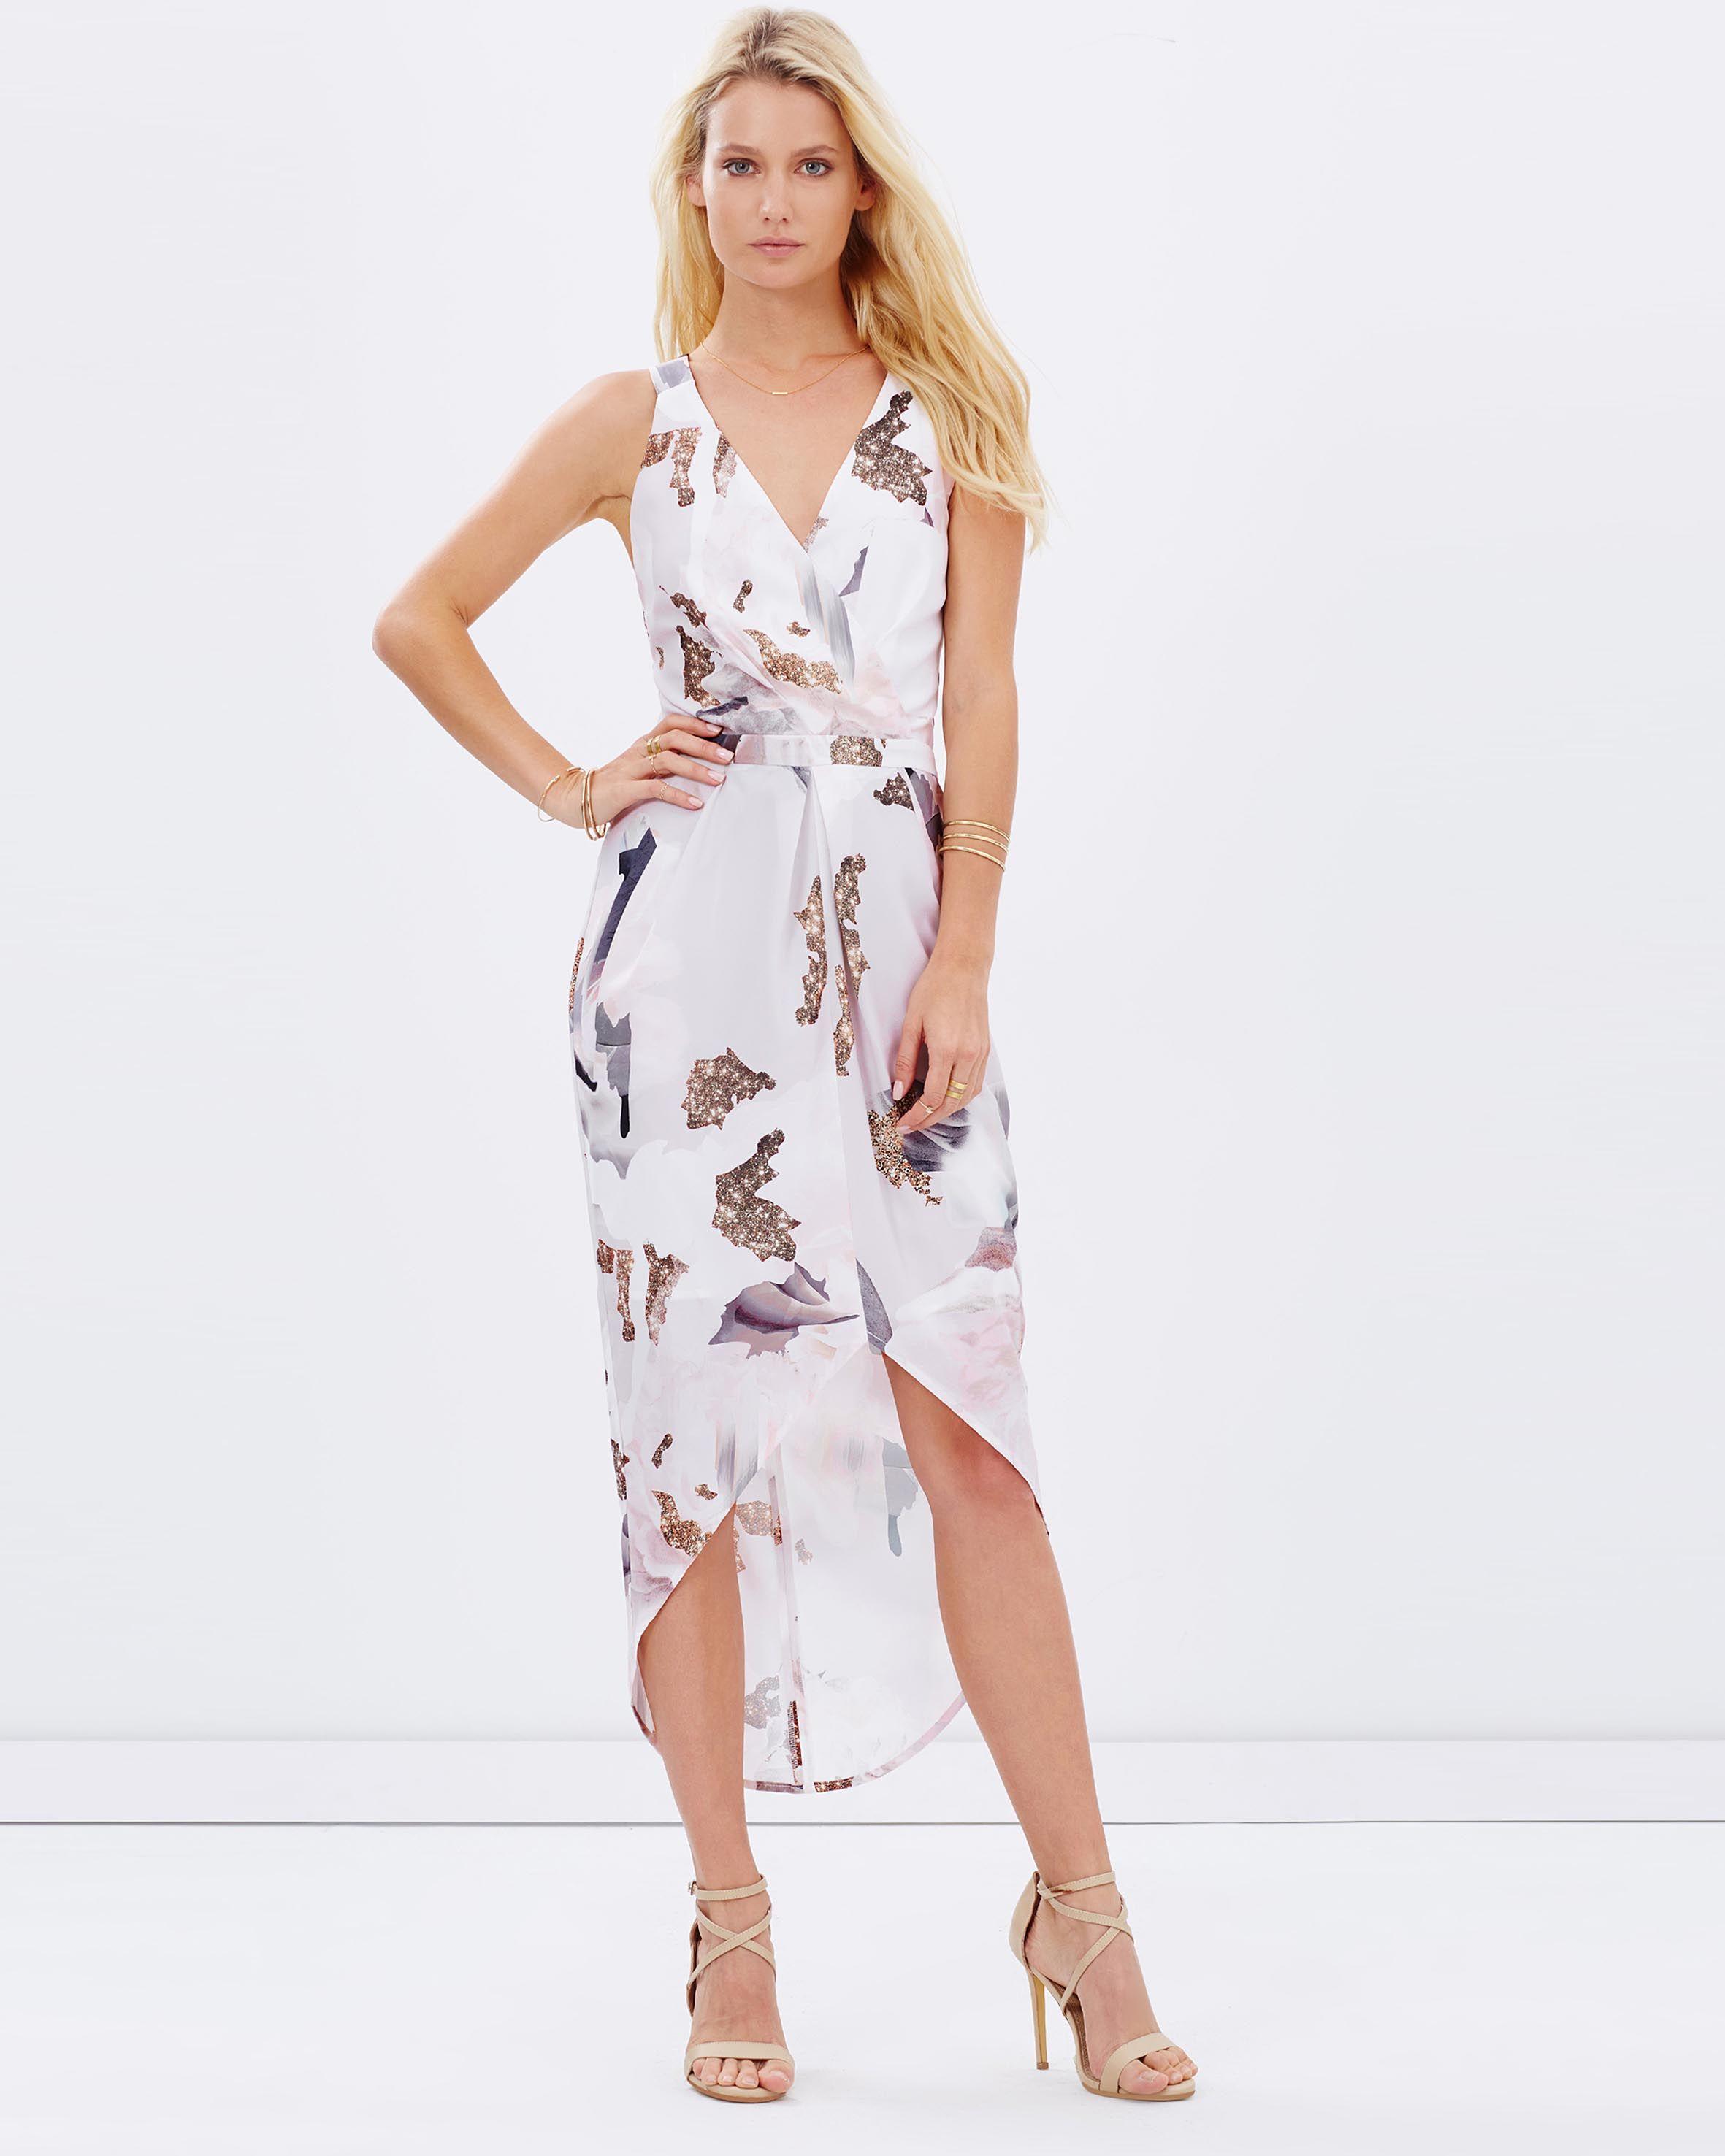 vogue flowy cocktail dress - Google Search | Timeless Fashion ...